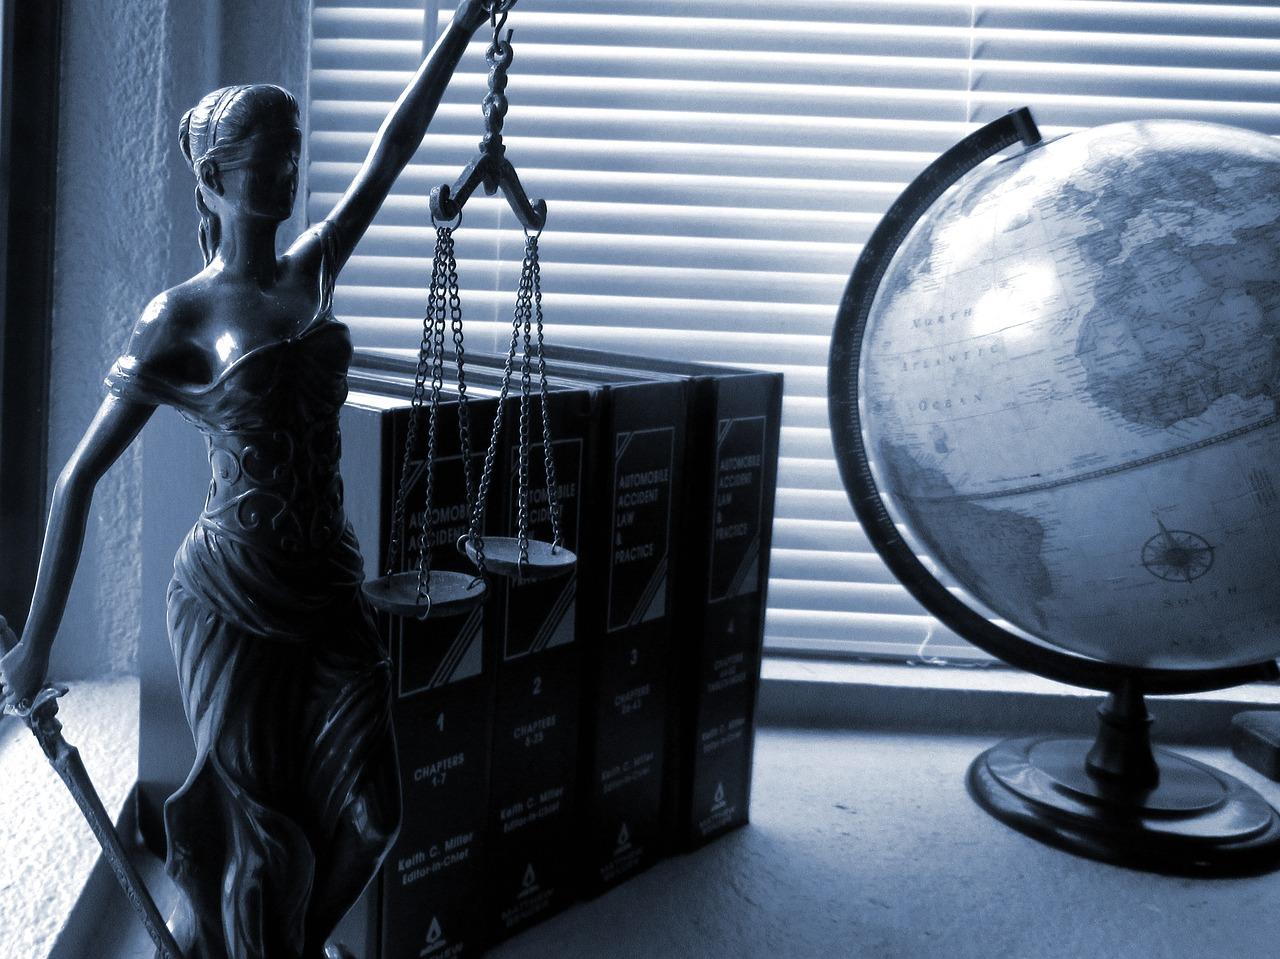 Compliance: Decimonovena Sentencia Tribunal Supremo